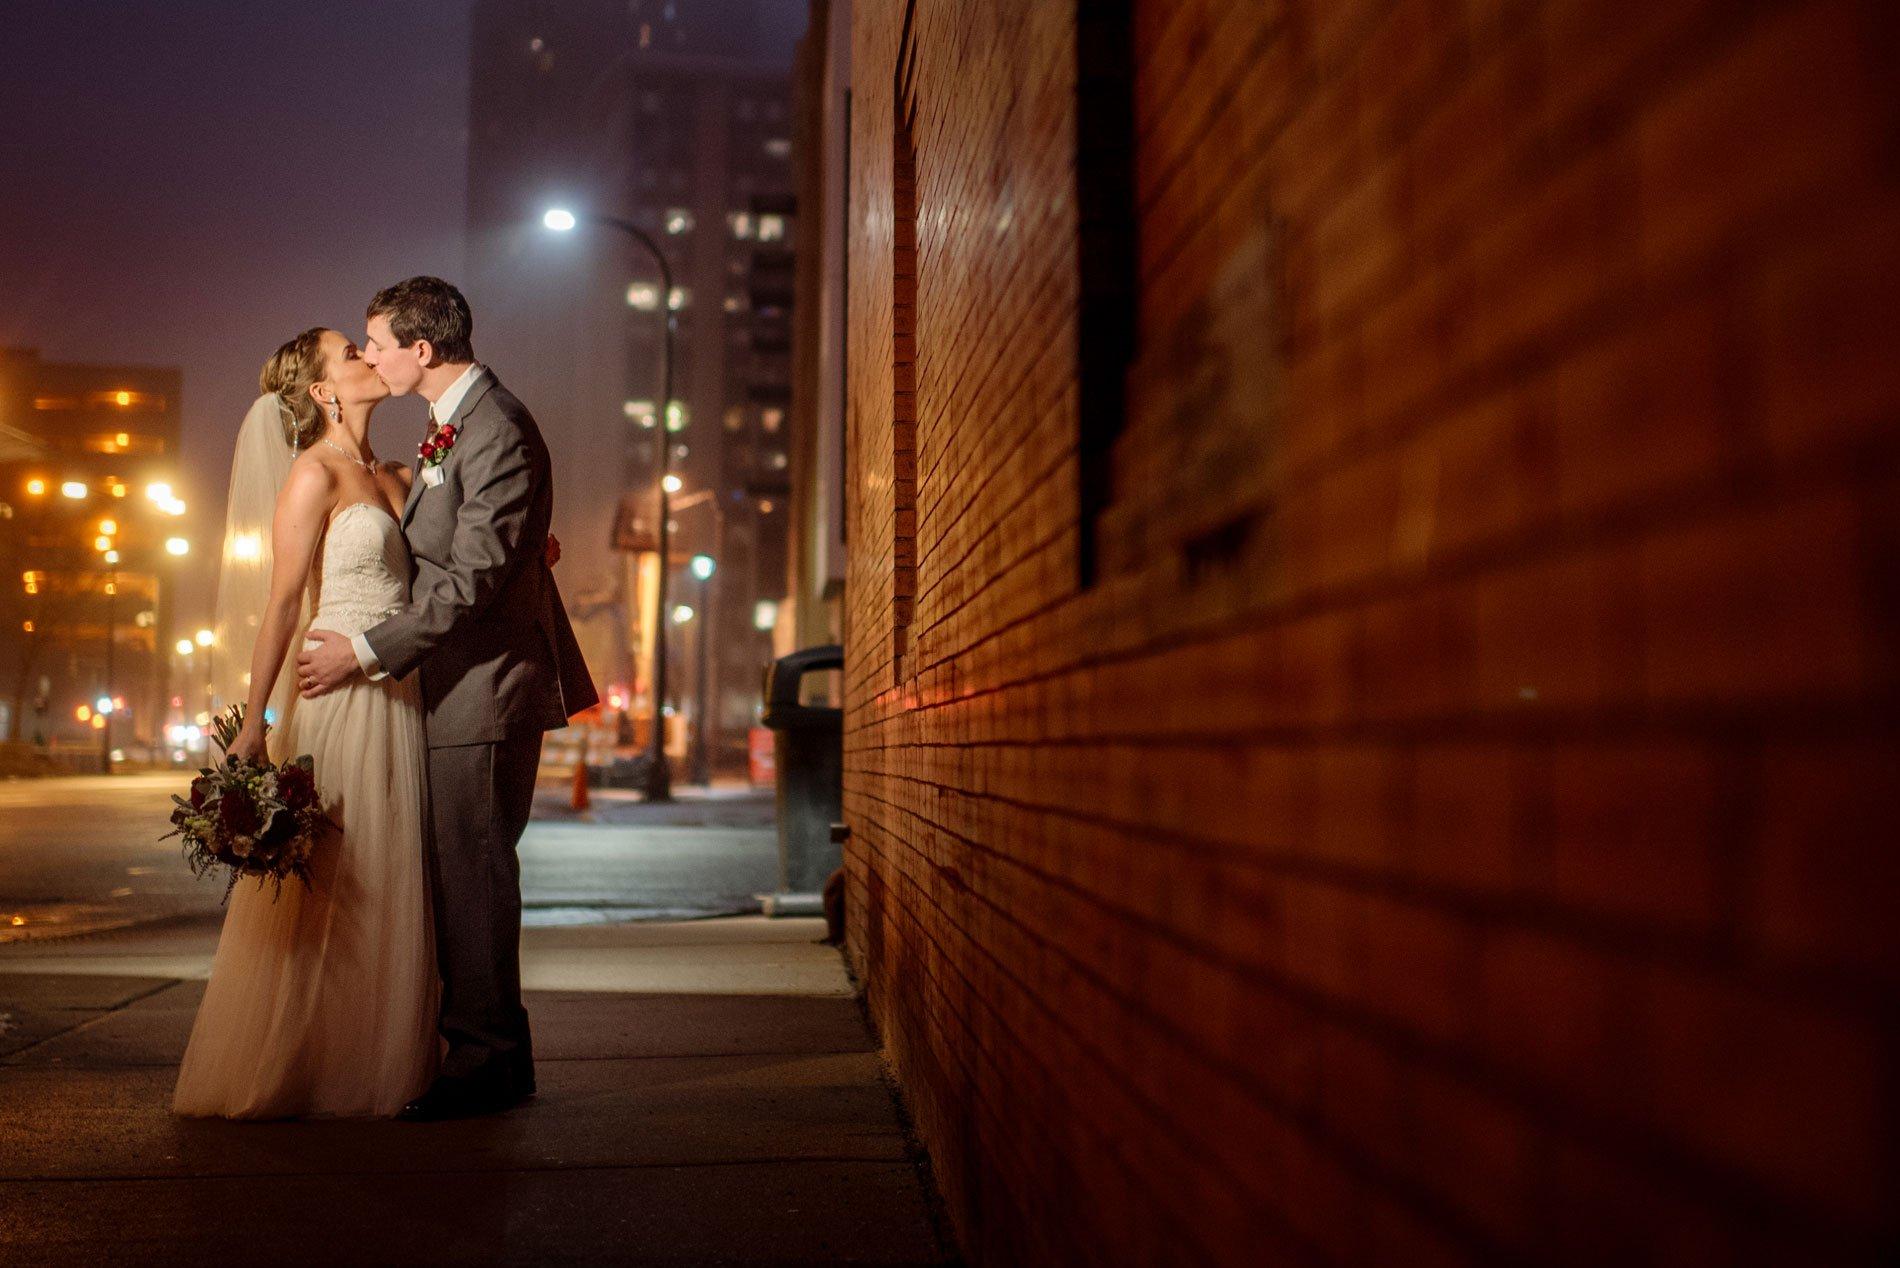 best-minneapolis-wedding-photographer-slideshow-2